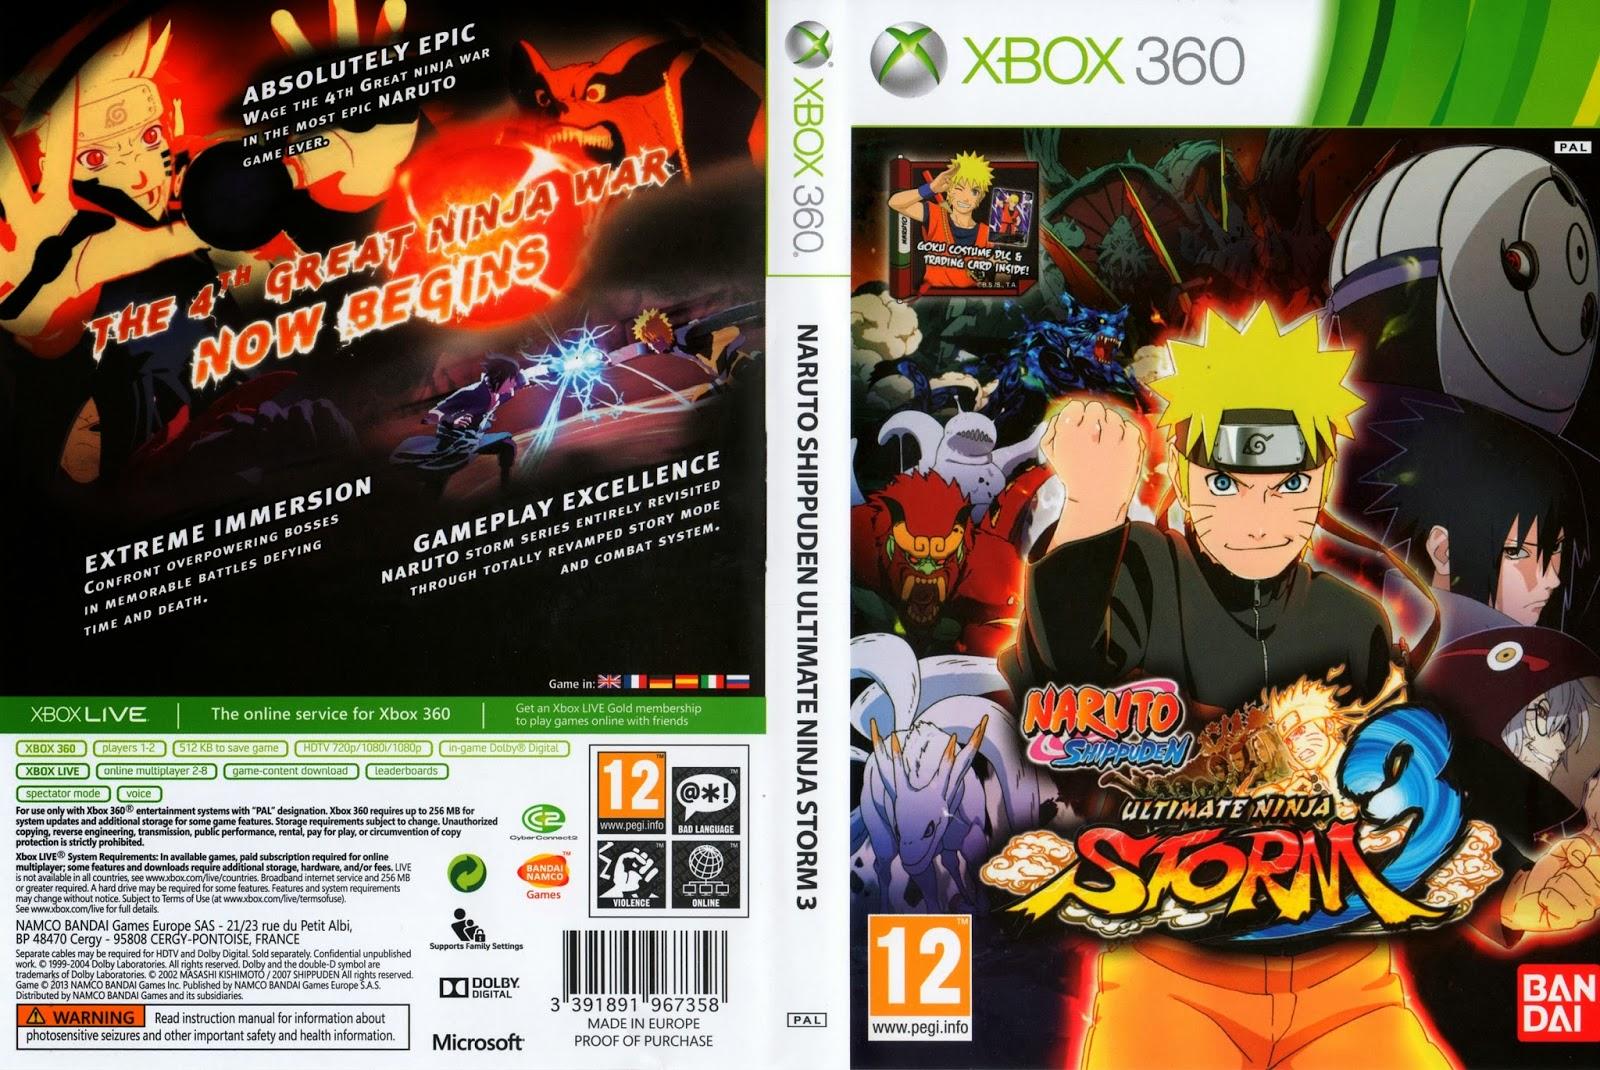 Naruto shippuden ultimate ninja storm revolution xbox360 - zamunda hızlı torrent